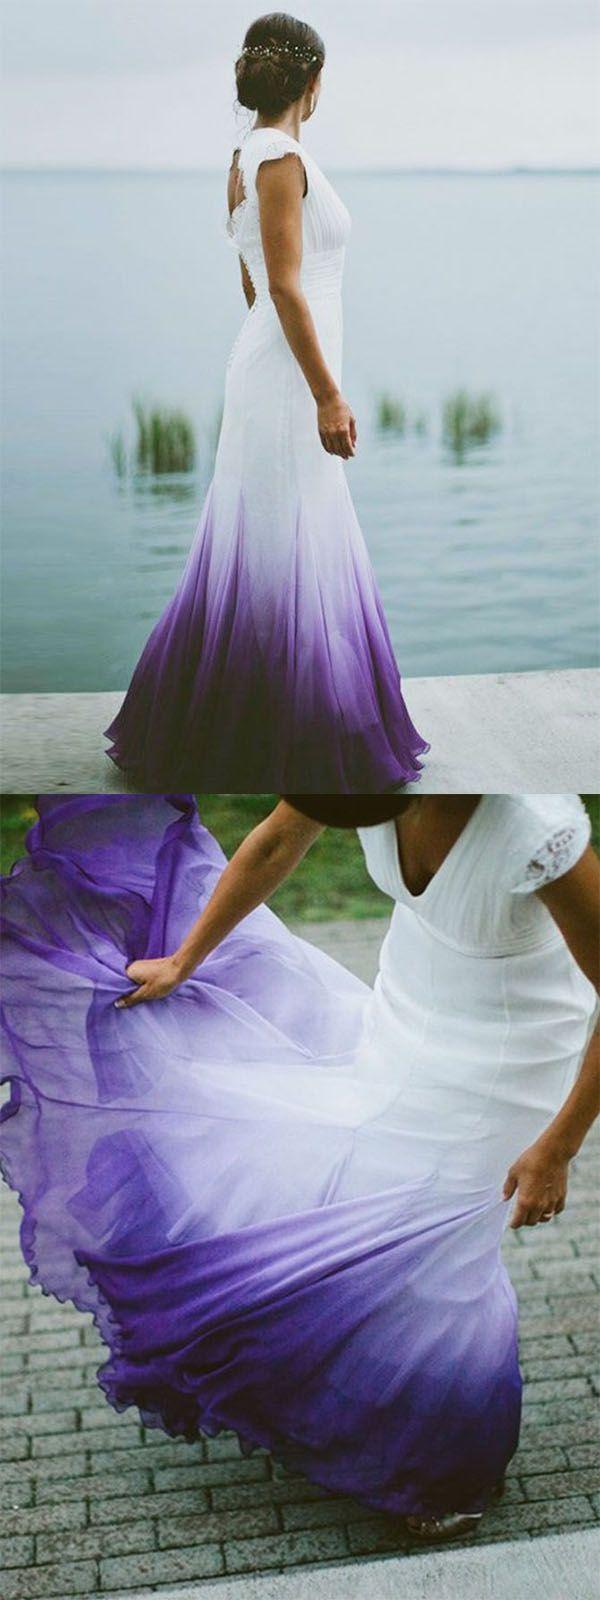 A Line V Neck Open Back Ombre Purple Chiffon Wedding Dress With Lace Purple Wedding Dress Ombre Wedding Dress V Neck Wedding Dress [ 1600 x 600 Pixel ]